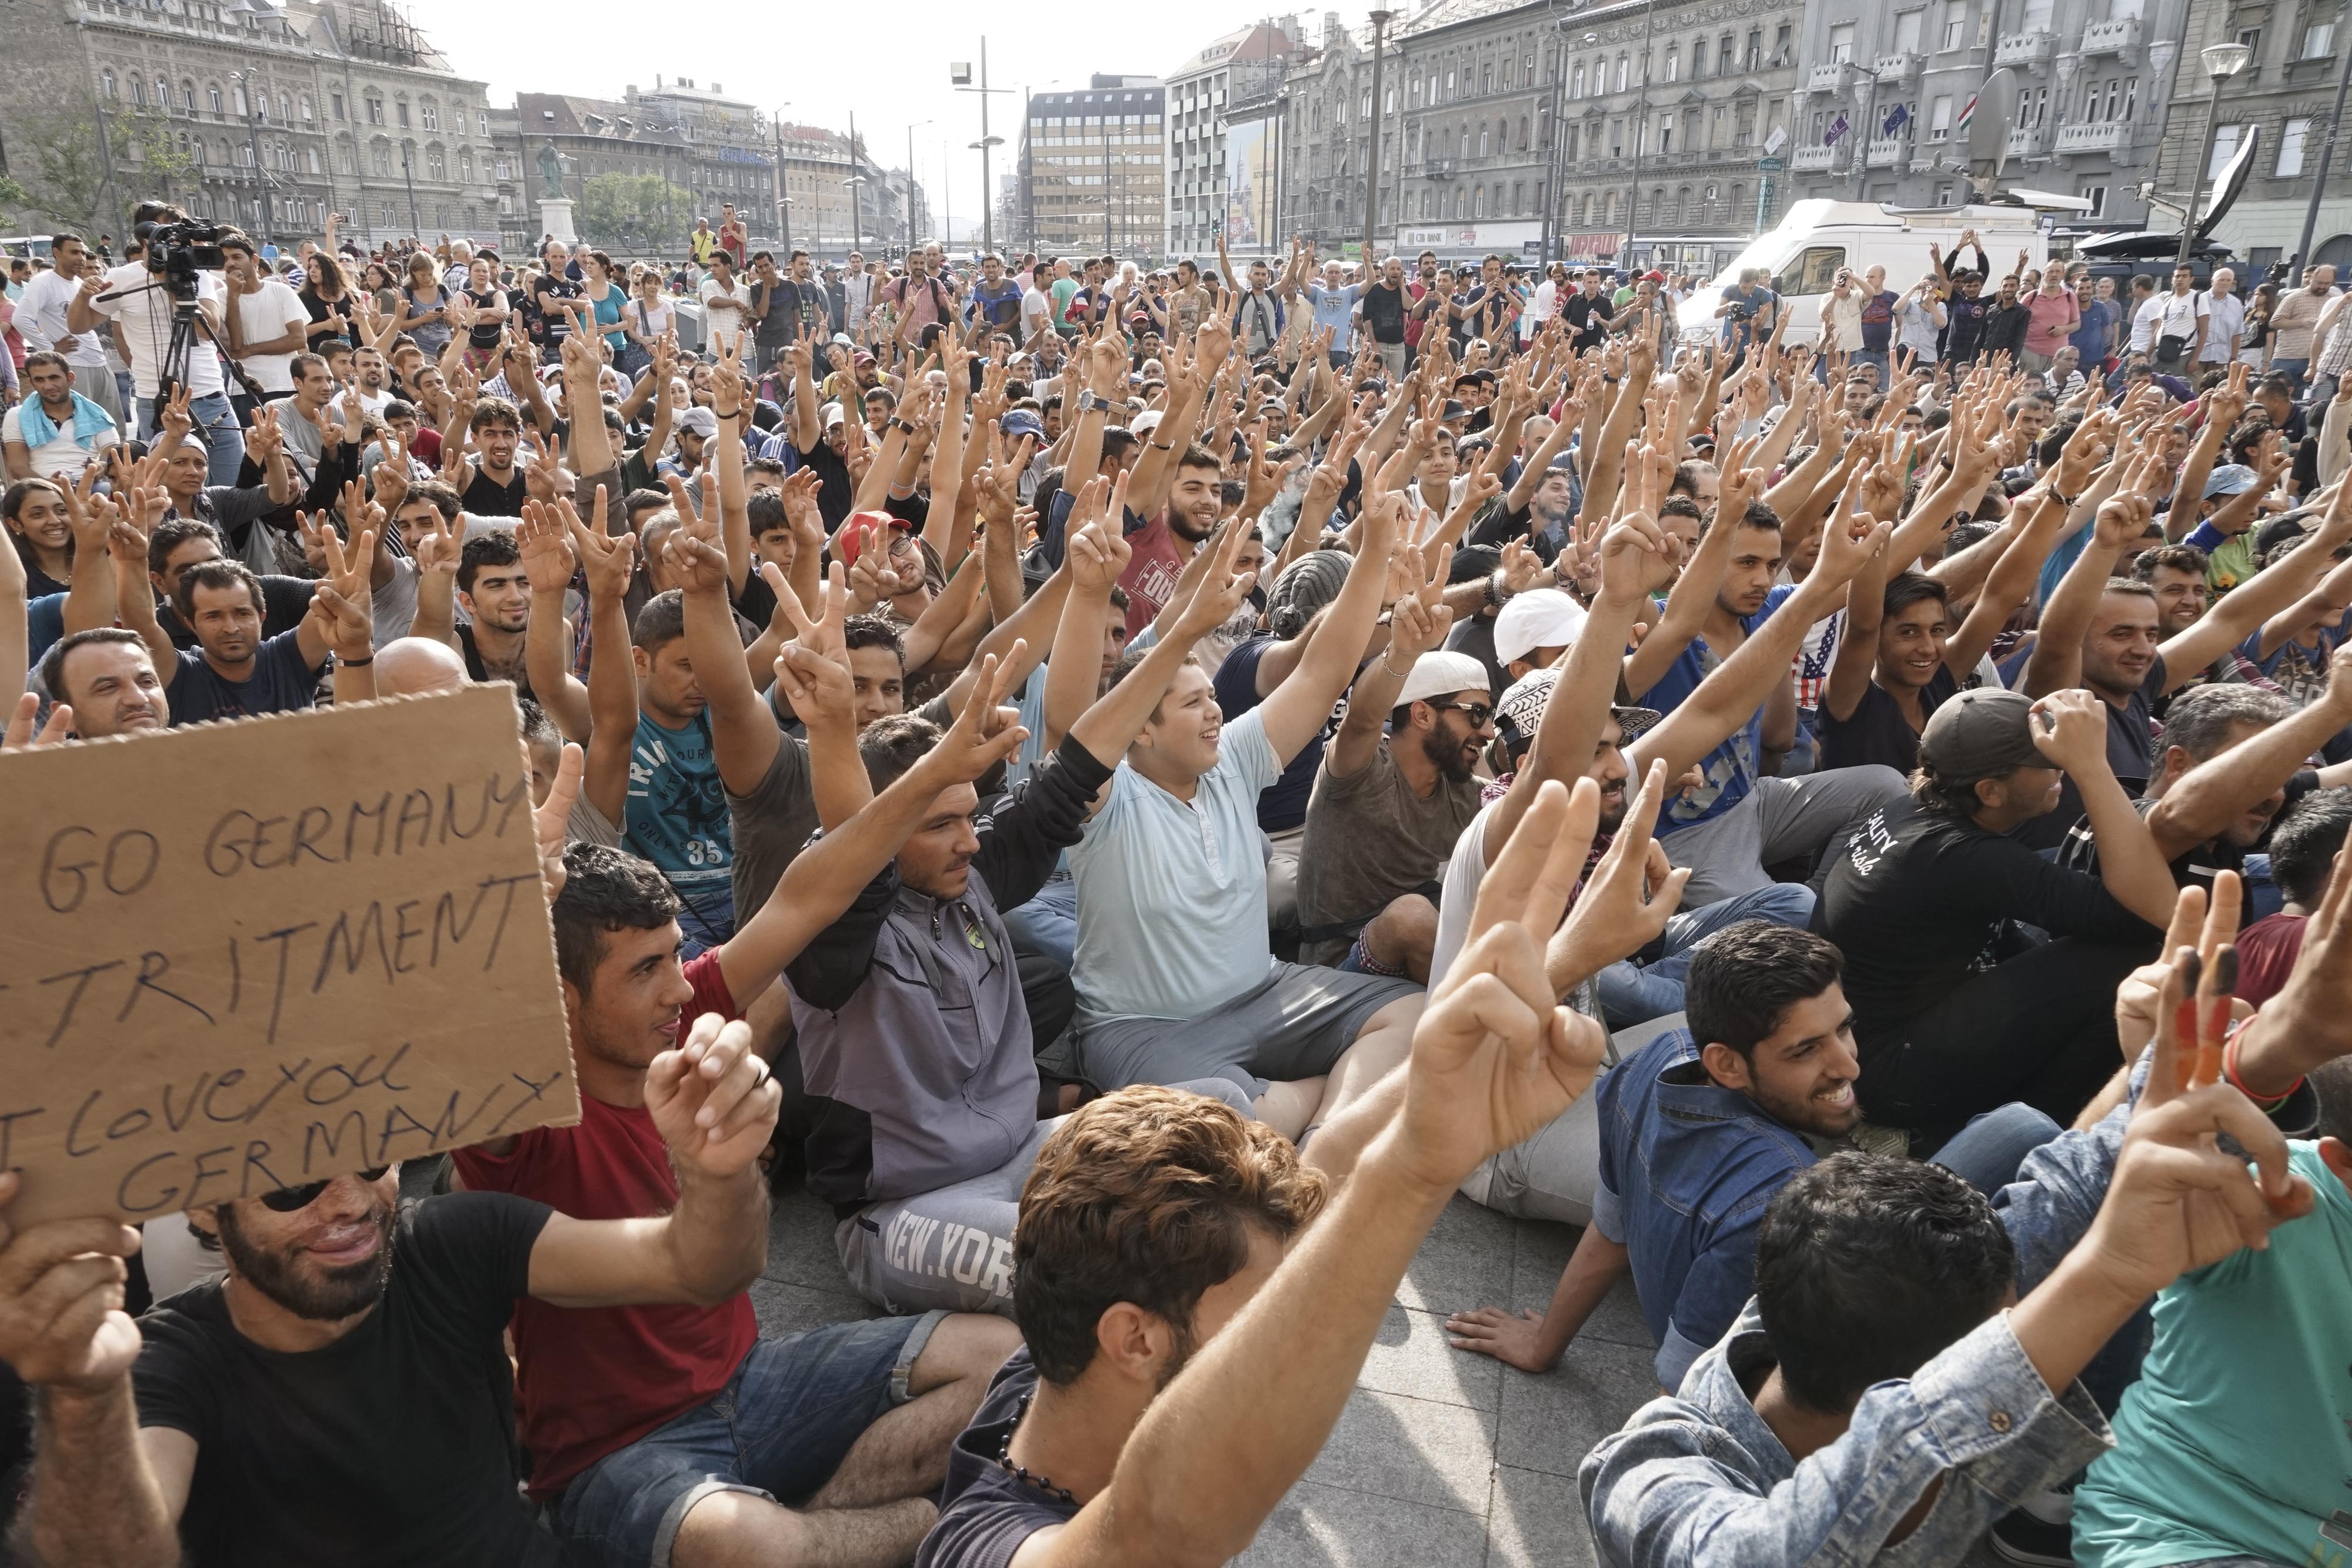 ... Refugee crisis. Budapest, Hungary, Central Europe, 3 September 2015